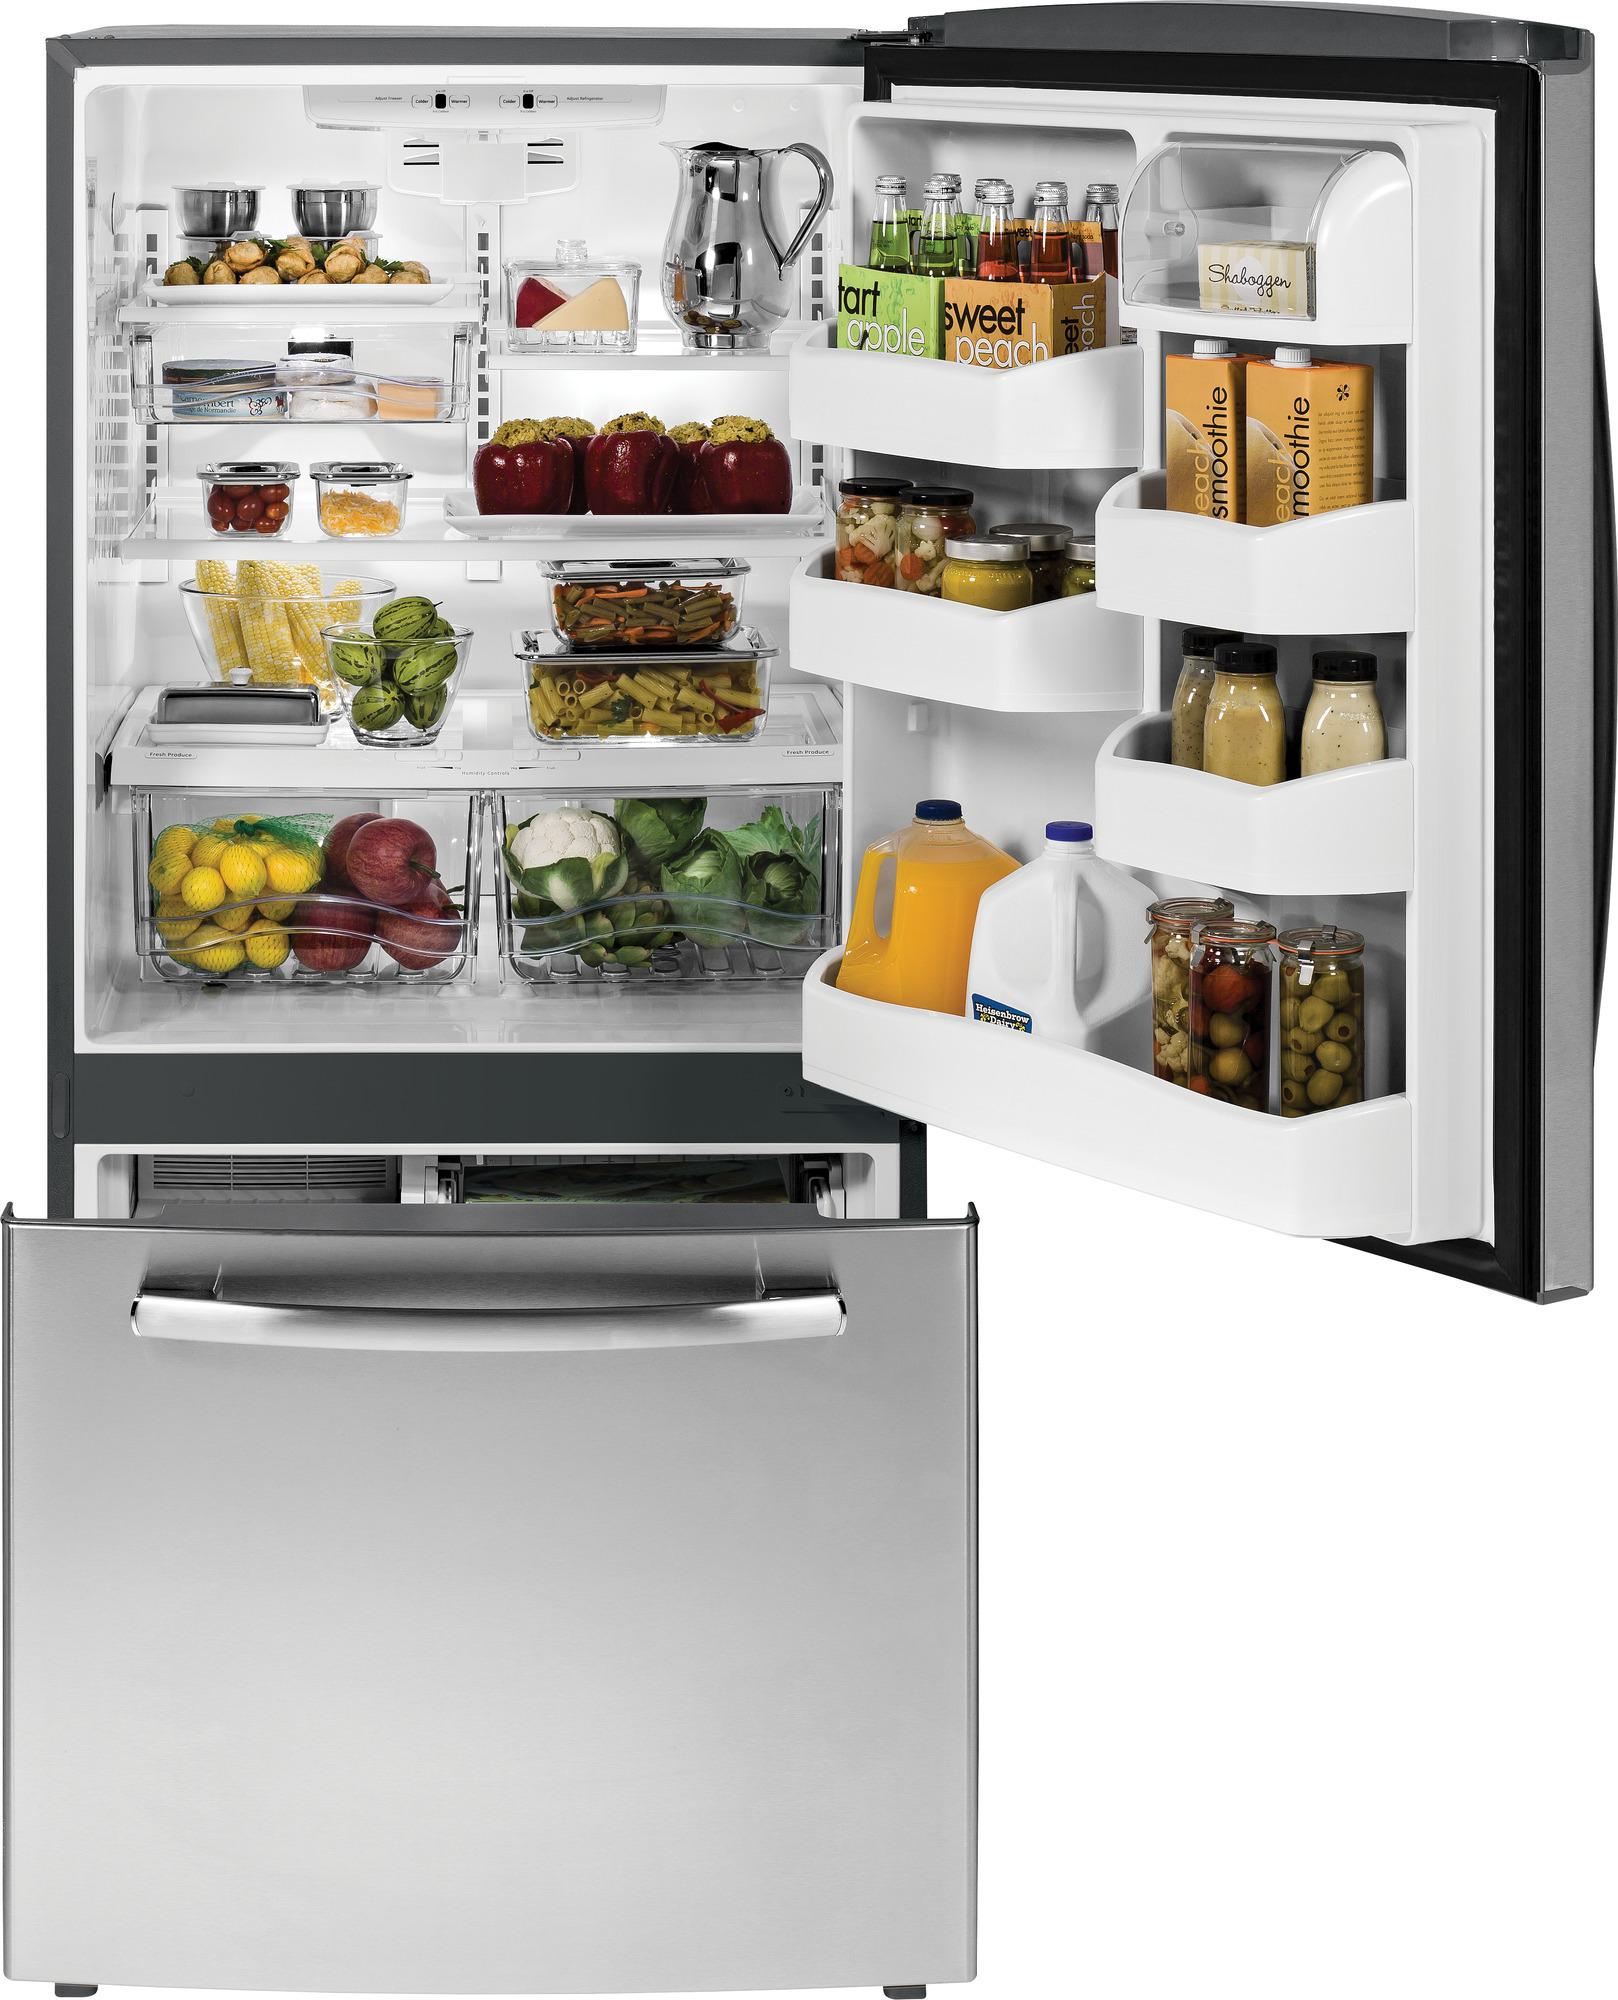 GE Appliances 23.2 cu. ft. Bottom-Freezer Drawer Refrigerator - Stainless Steel